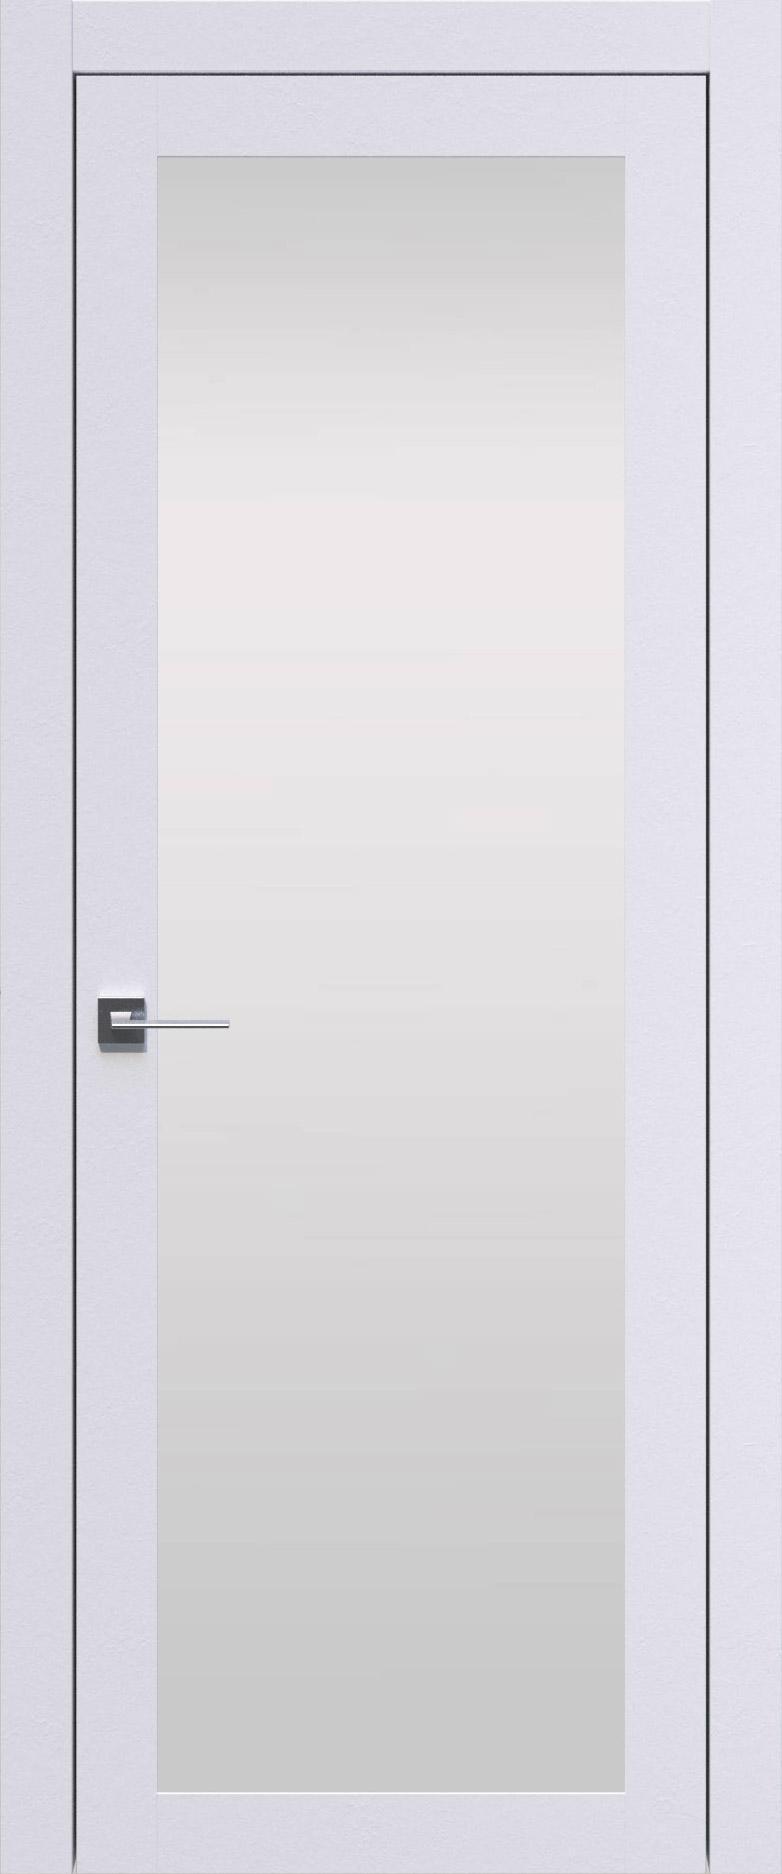 Tivoli З-1 цвет - Арктик белый Со стеклом (ДО)